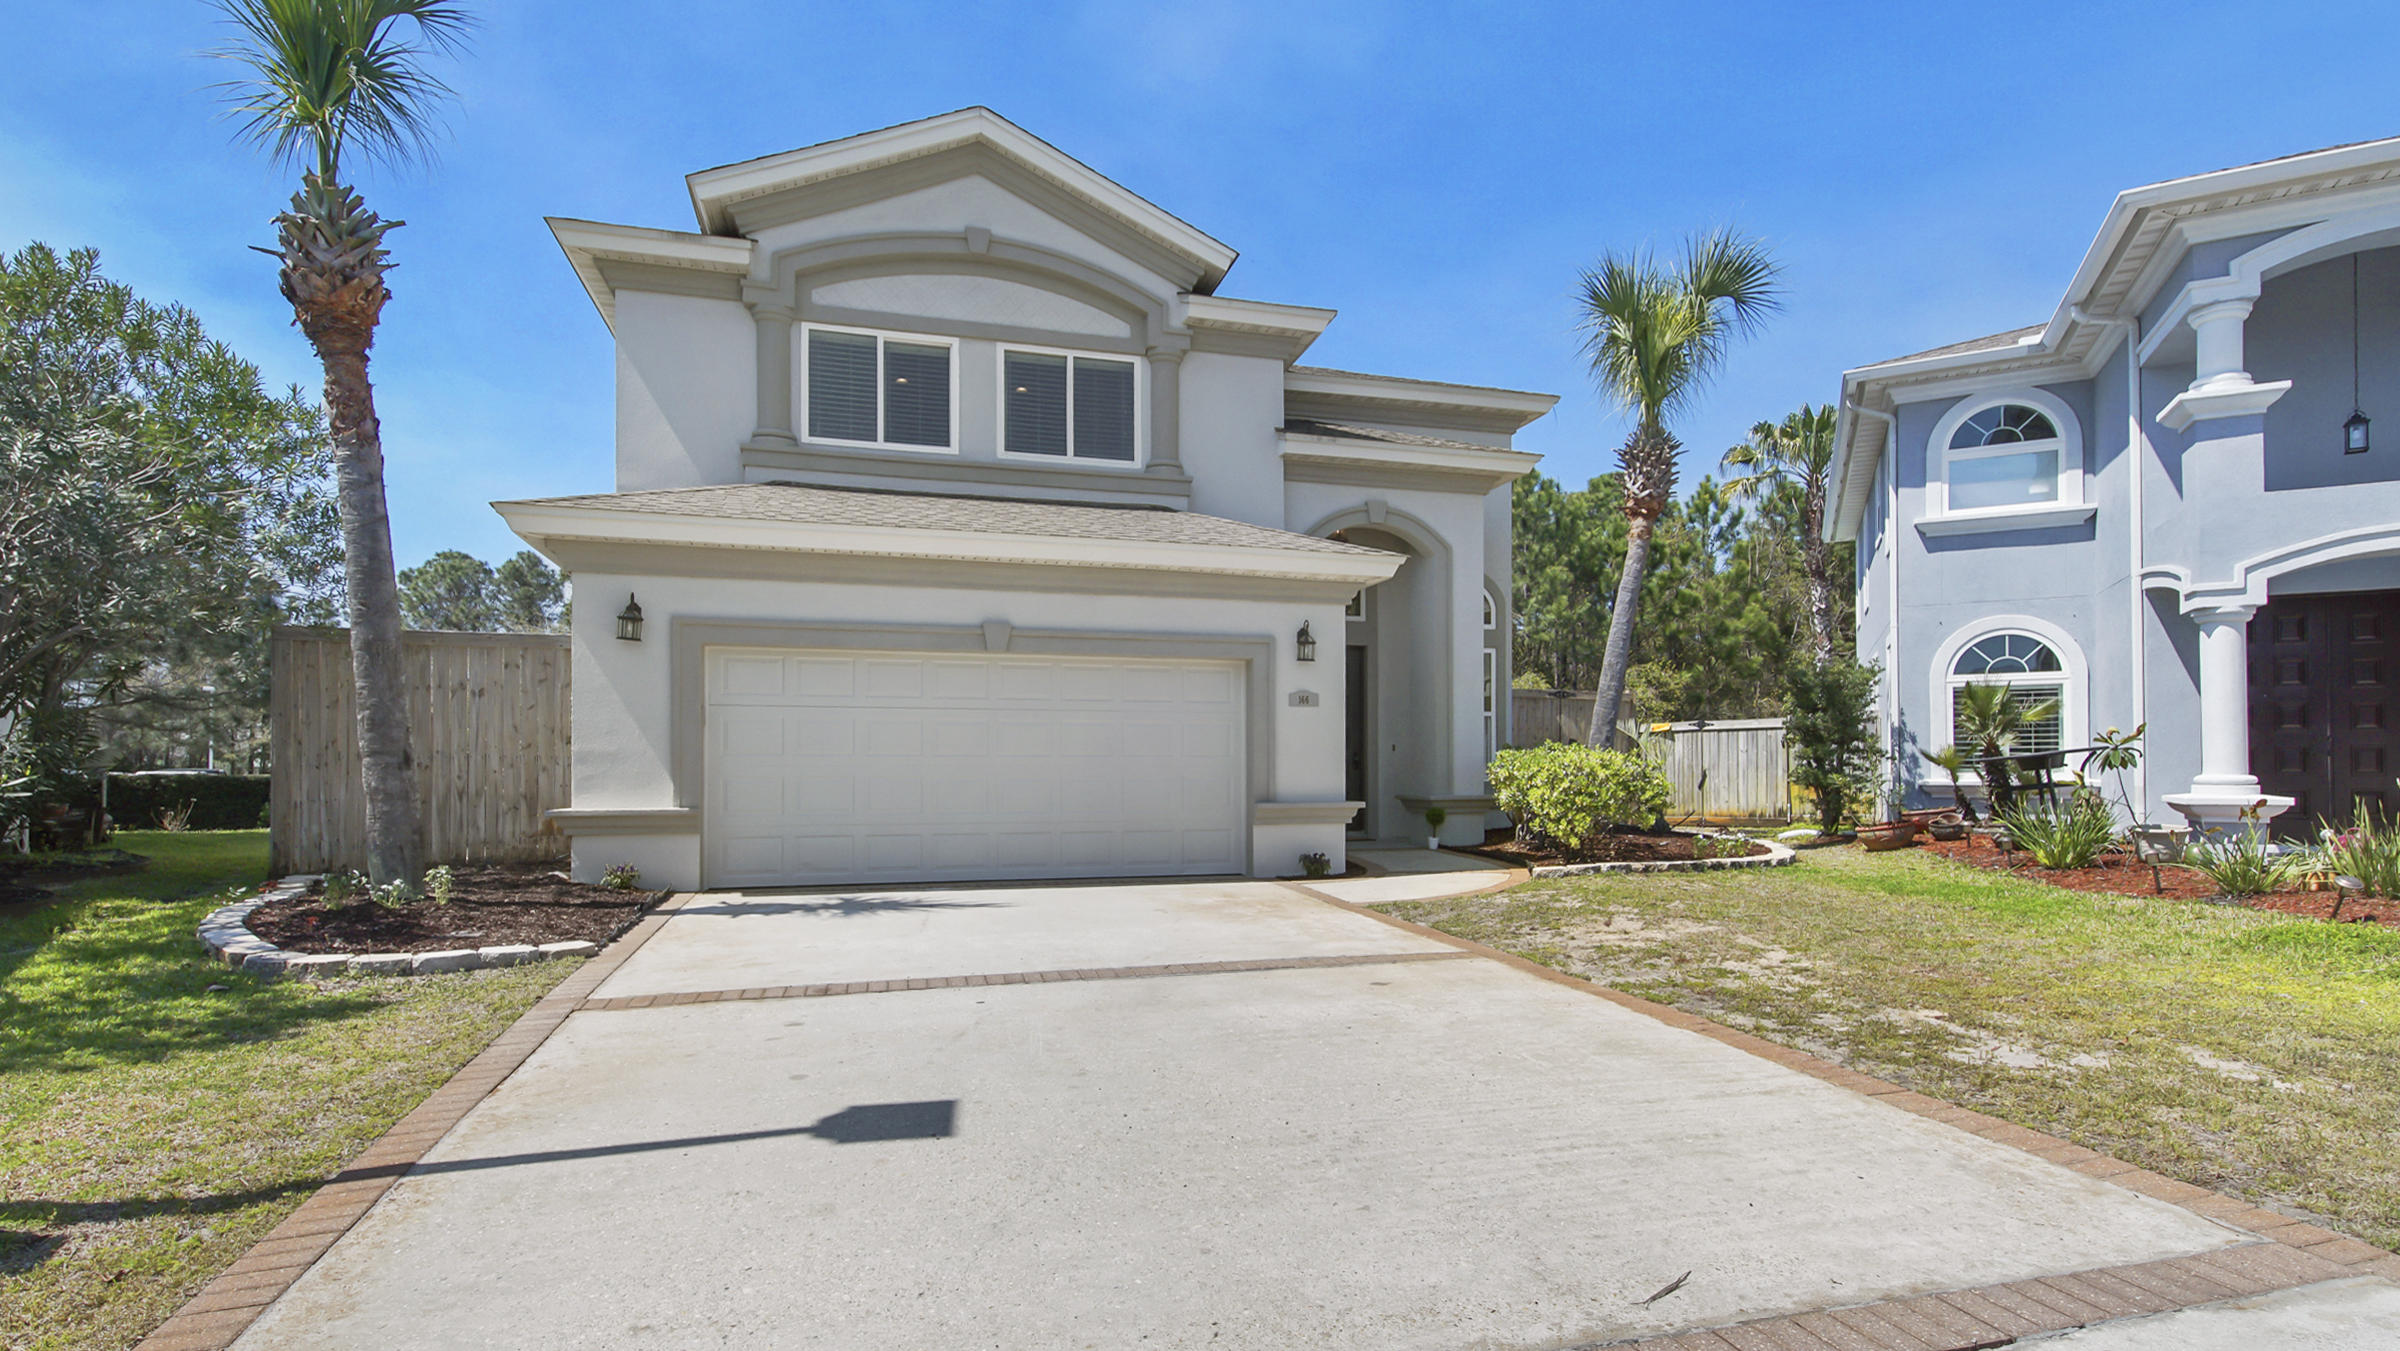 Photo of home for sale at 166 Dominica, Miramar Beach FL